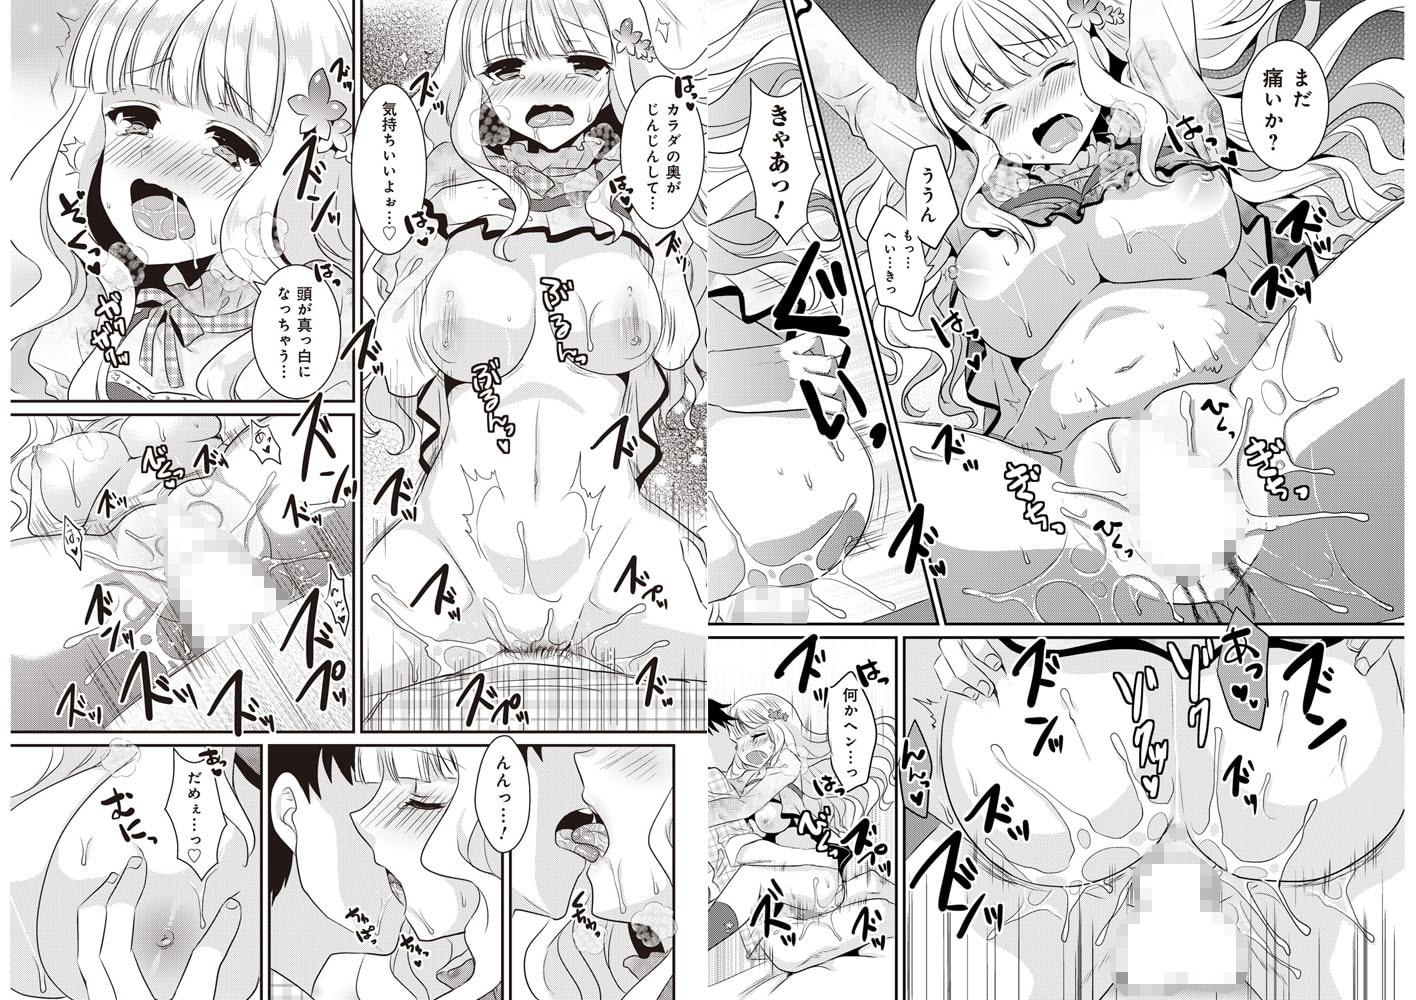 YOUNGキュン! vol.3